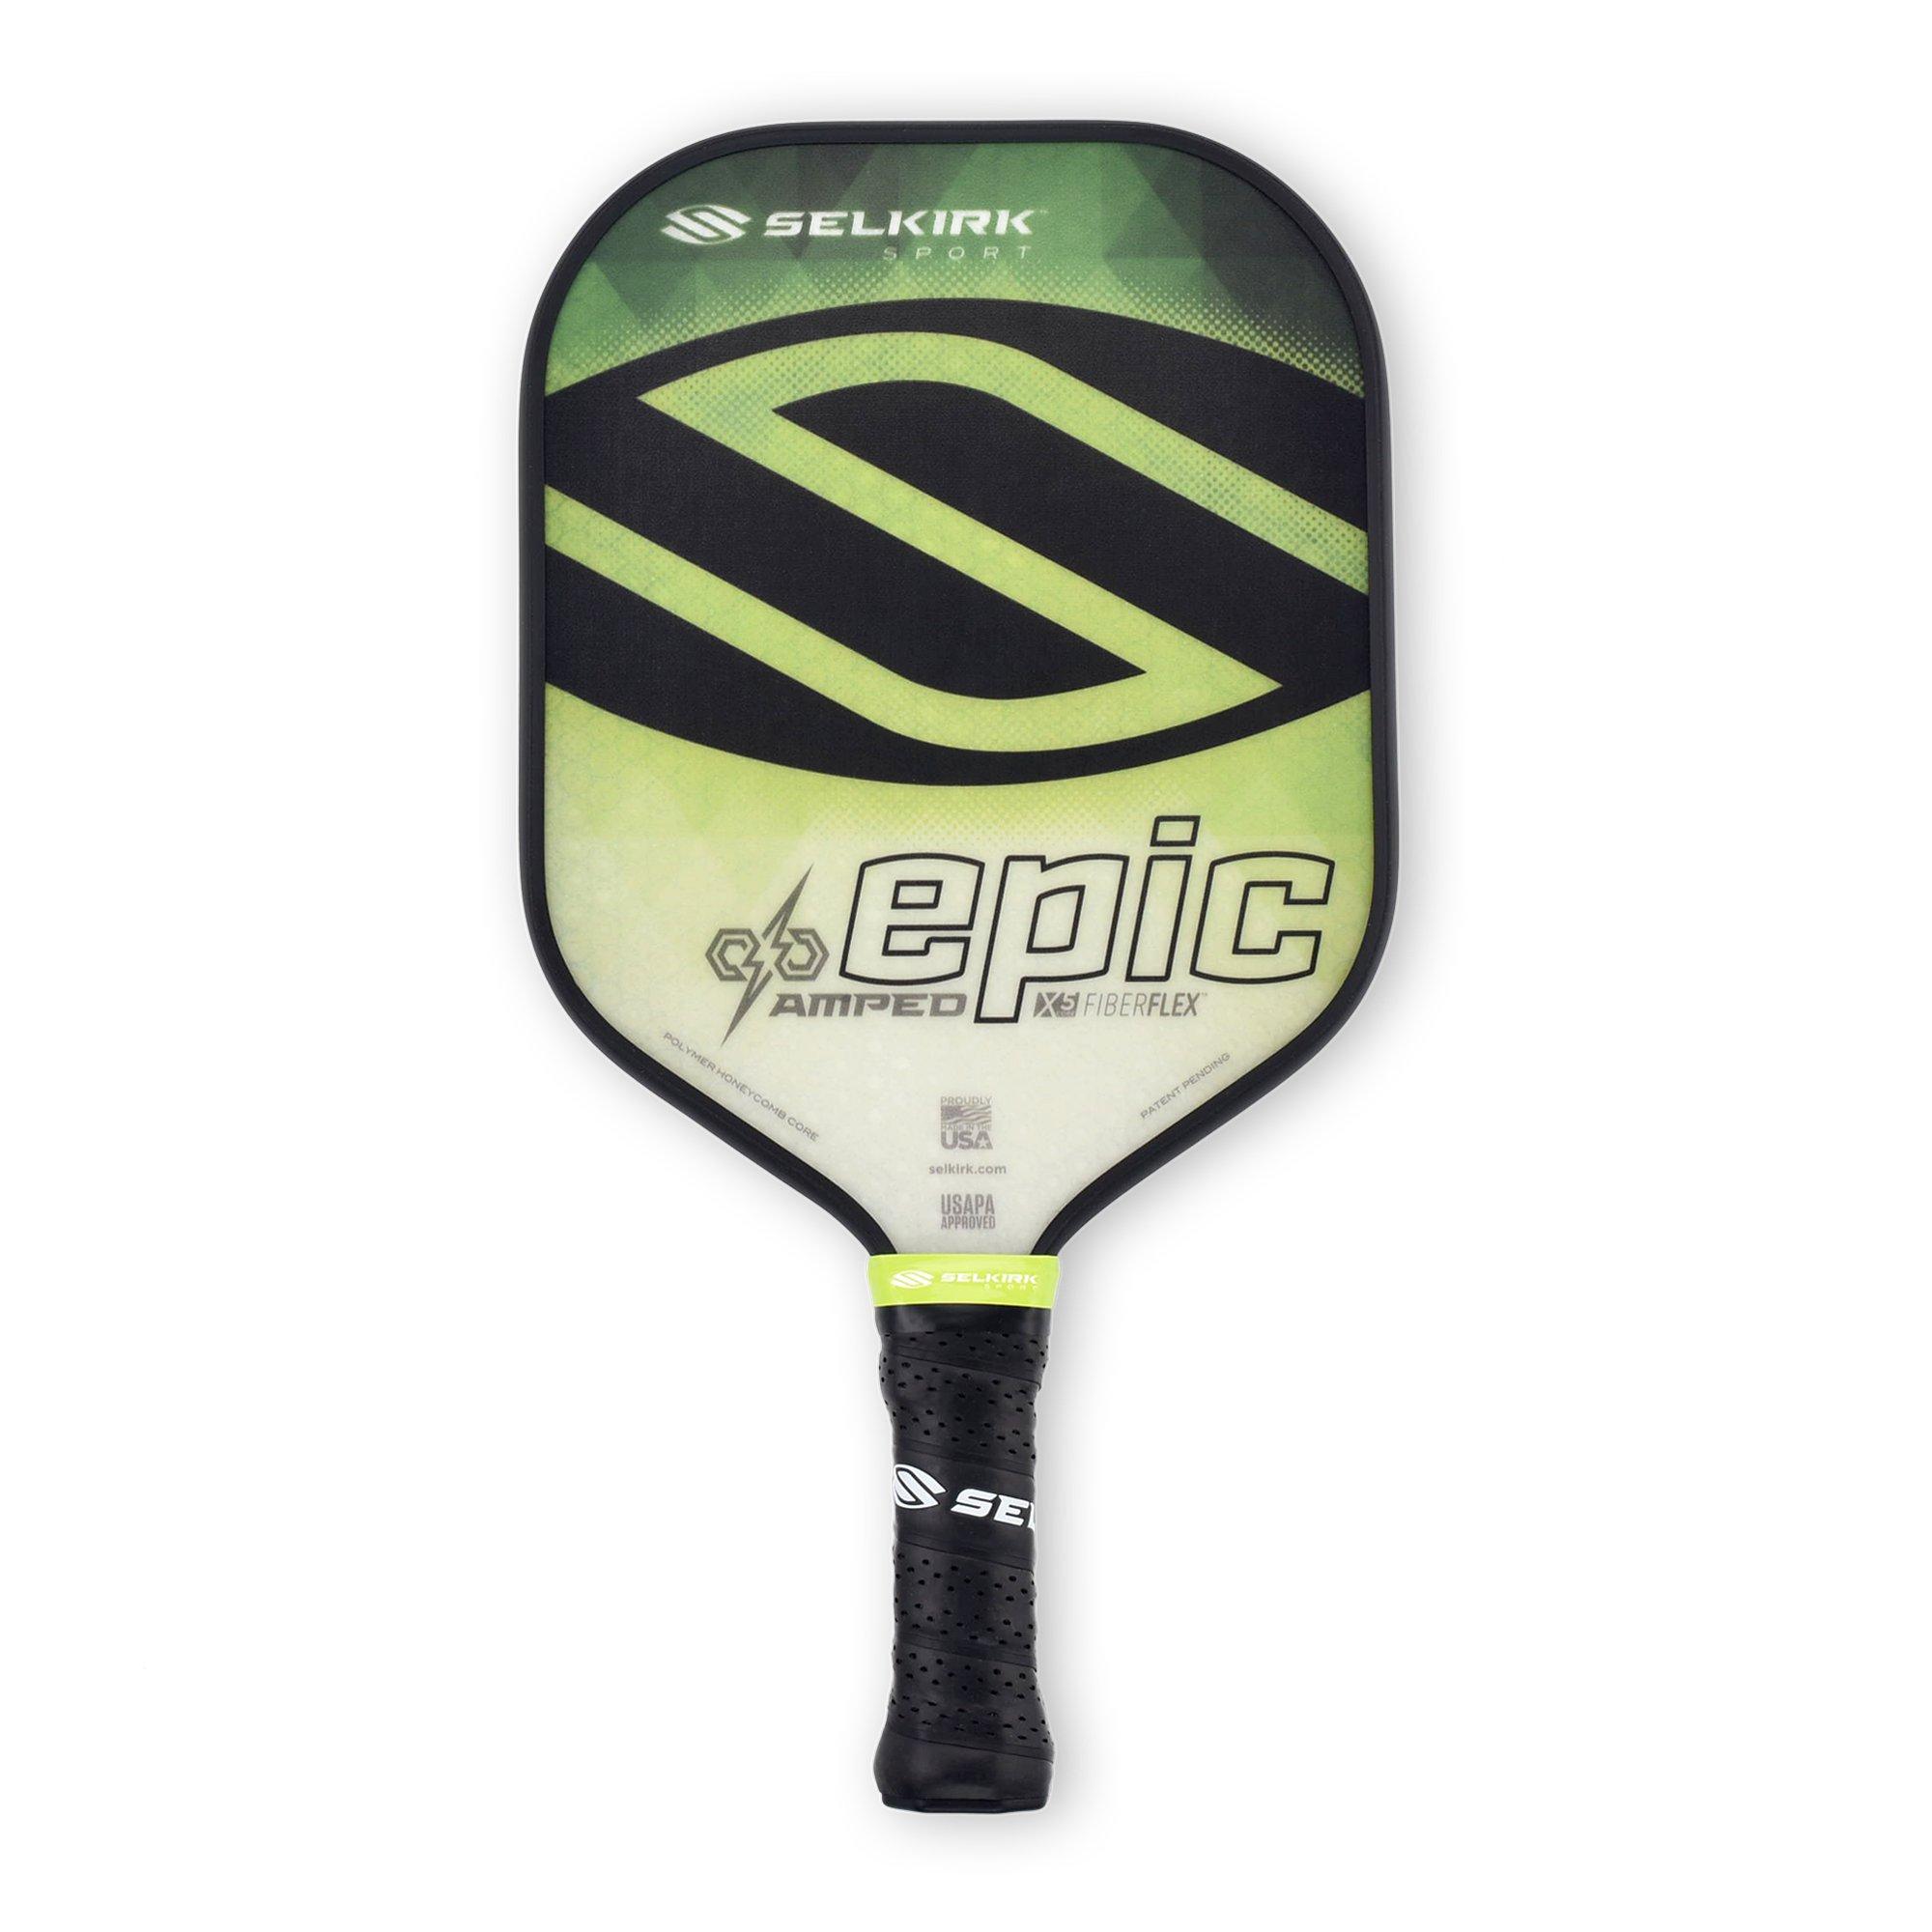 Selkirk Amped Pickleball Paddle - USAPA Approved - X5 Polypropylene Core - FiberFlex Fiberglass Face - 5 Sizes: Epic, S2, Omni, Maxima, and INVIKTA (Epic Midweight - Emerald Green) by Selkirk Sport